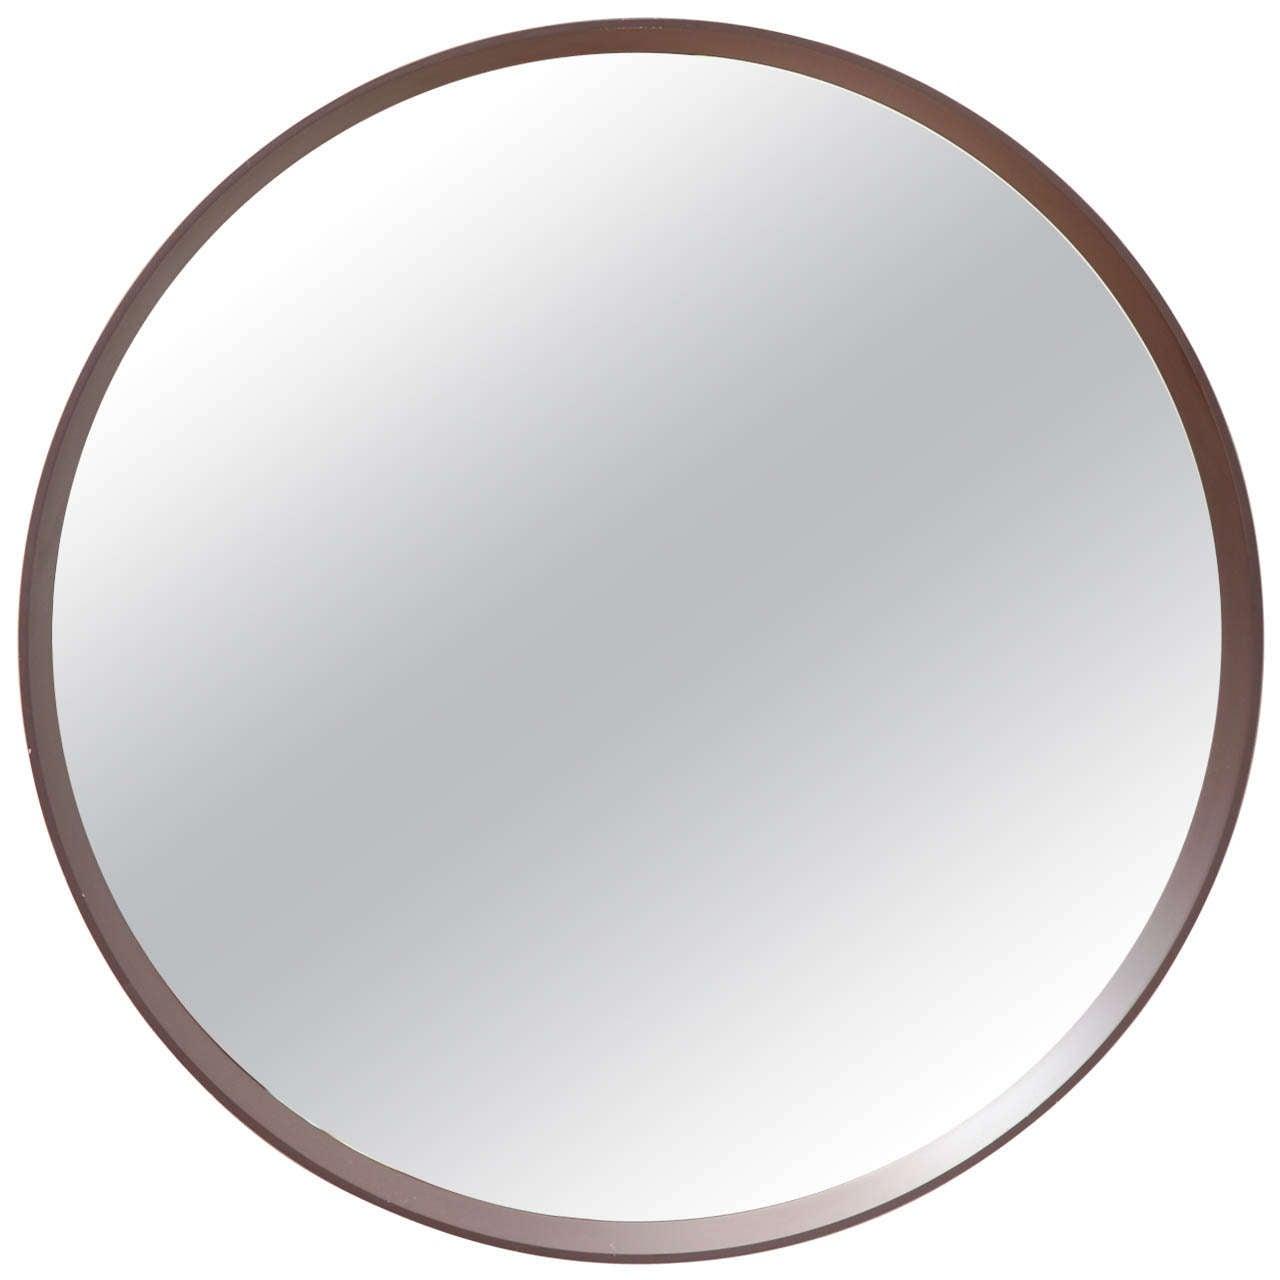 Mid century modern round mirror at 1stdibs for Modern mirrors